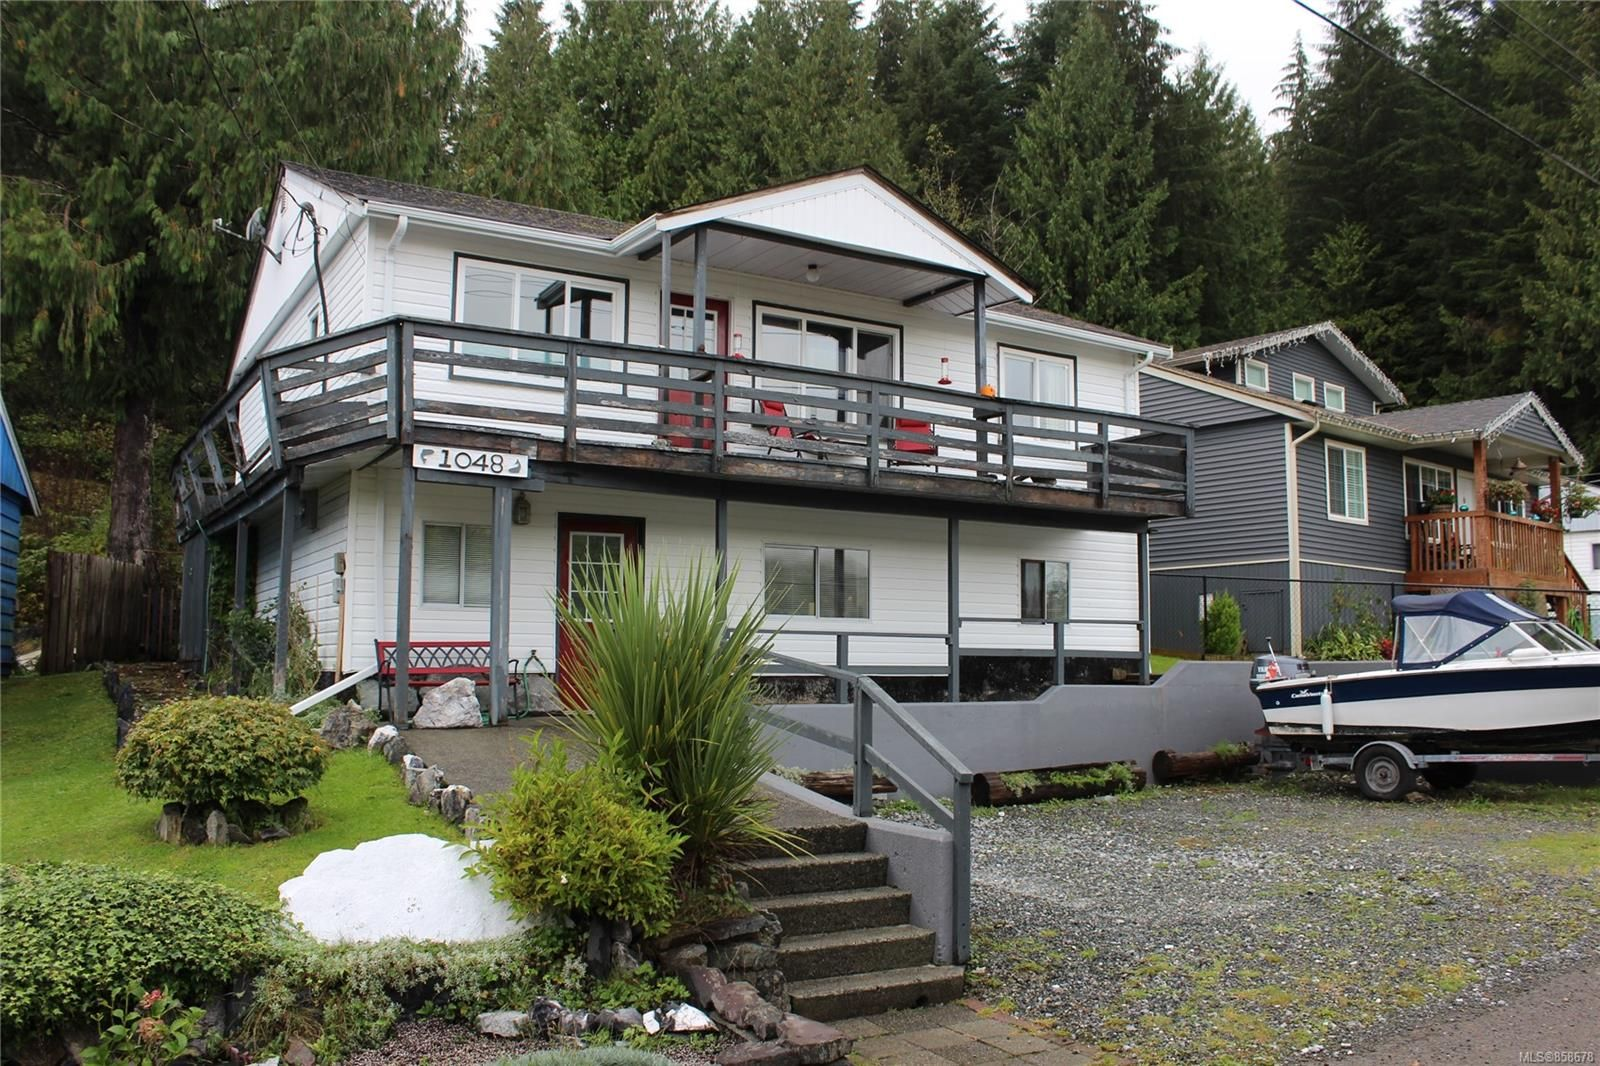 Main Photo: 1048 Resolution Rd in : NI Tahsis/Zeballos House for sale (North Island)  : MLS®# 858678